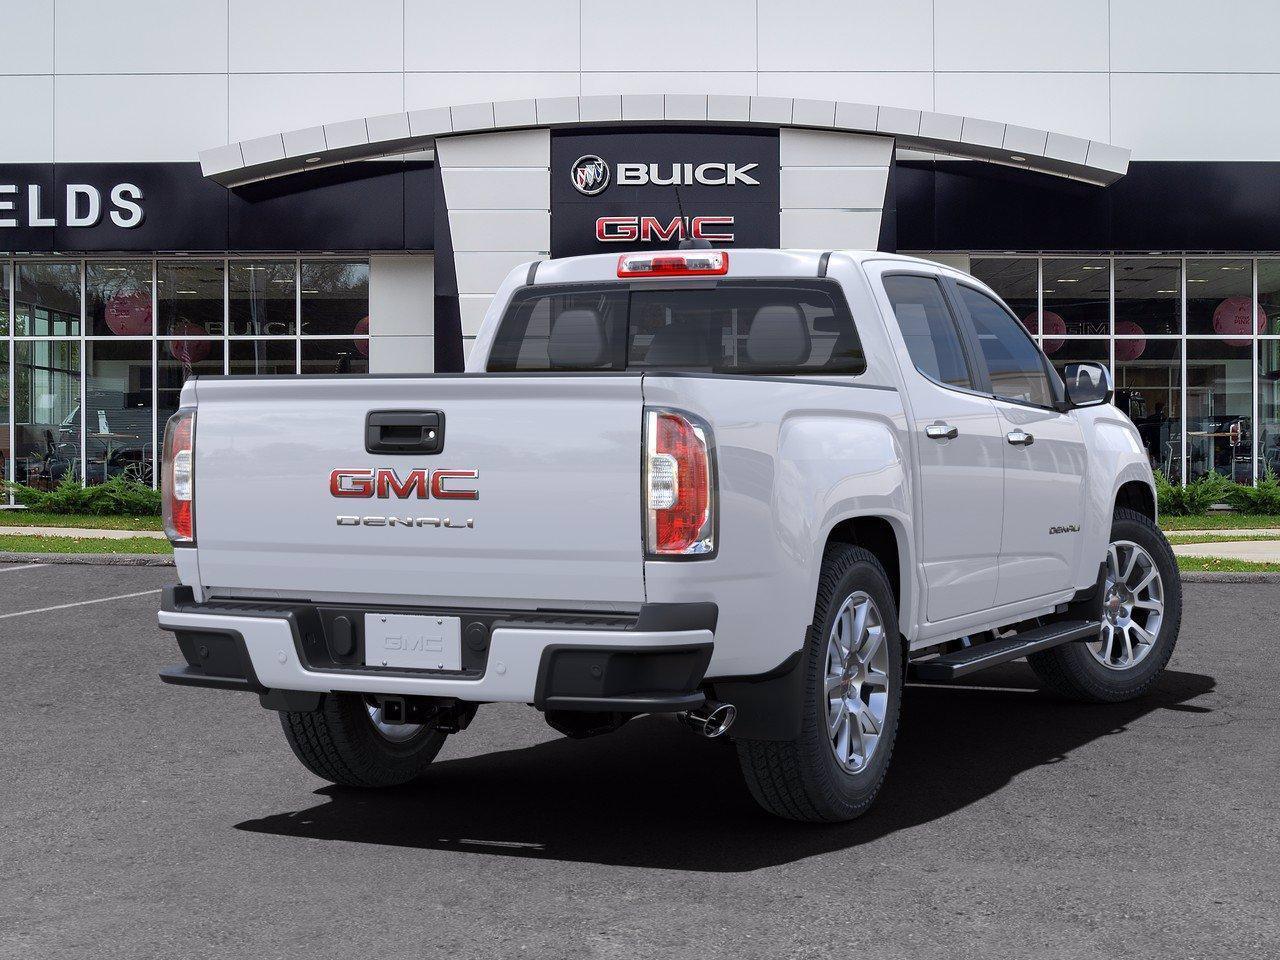 2021 GMC Canyon Crew Cab 4x4, Pickup #G21157 - photo 2